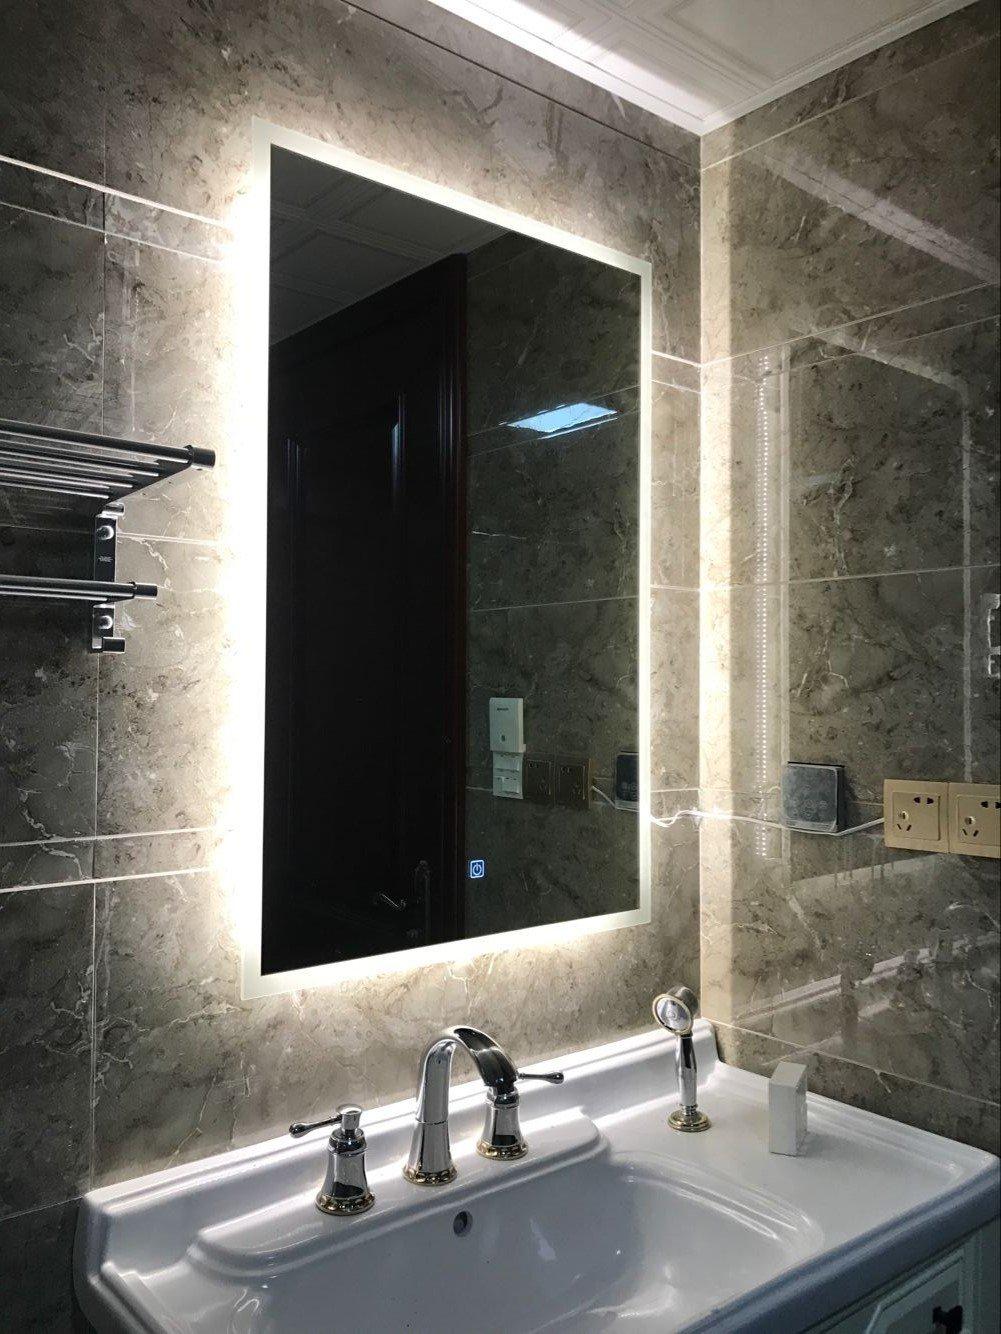 DIYHD W36'xH36' Box Diffusers Led Backlit Bathroom Mirror Vanity Square Wall Mount Bathroom Finger Touch Light Mirror